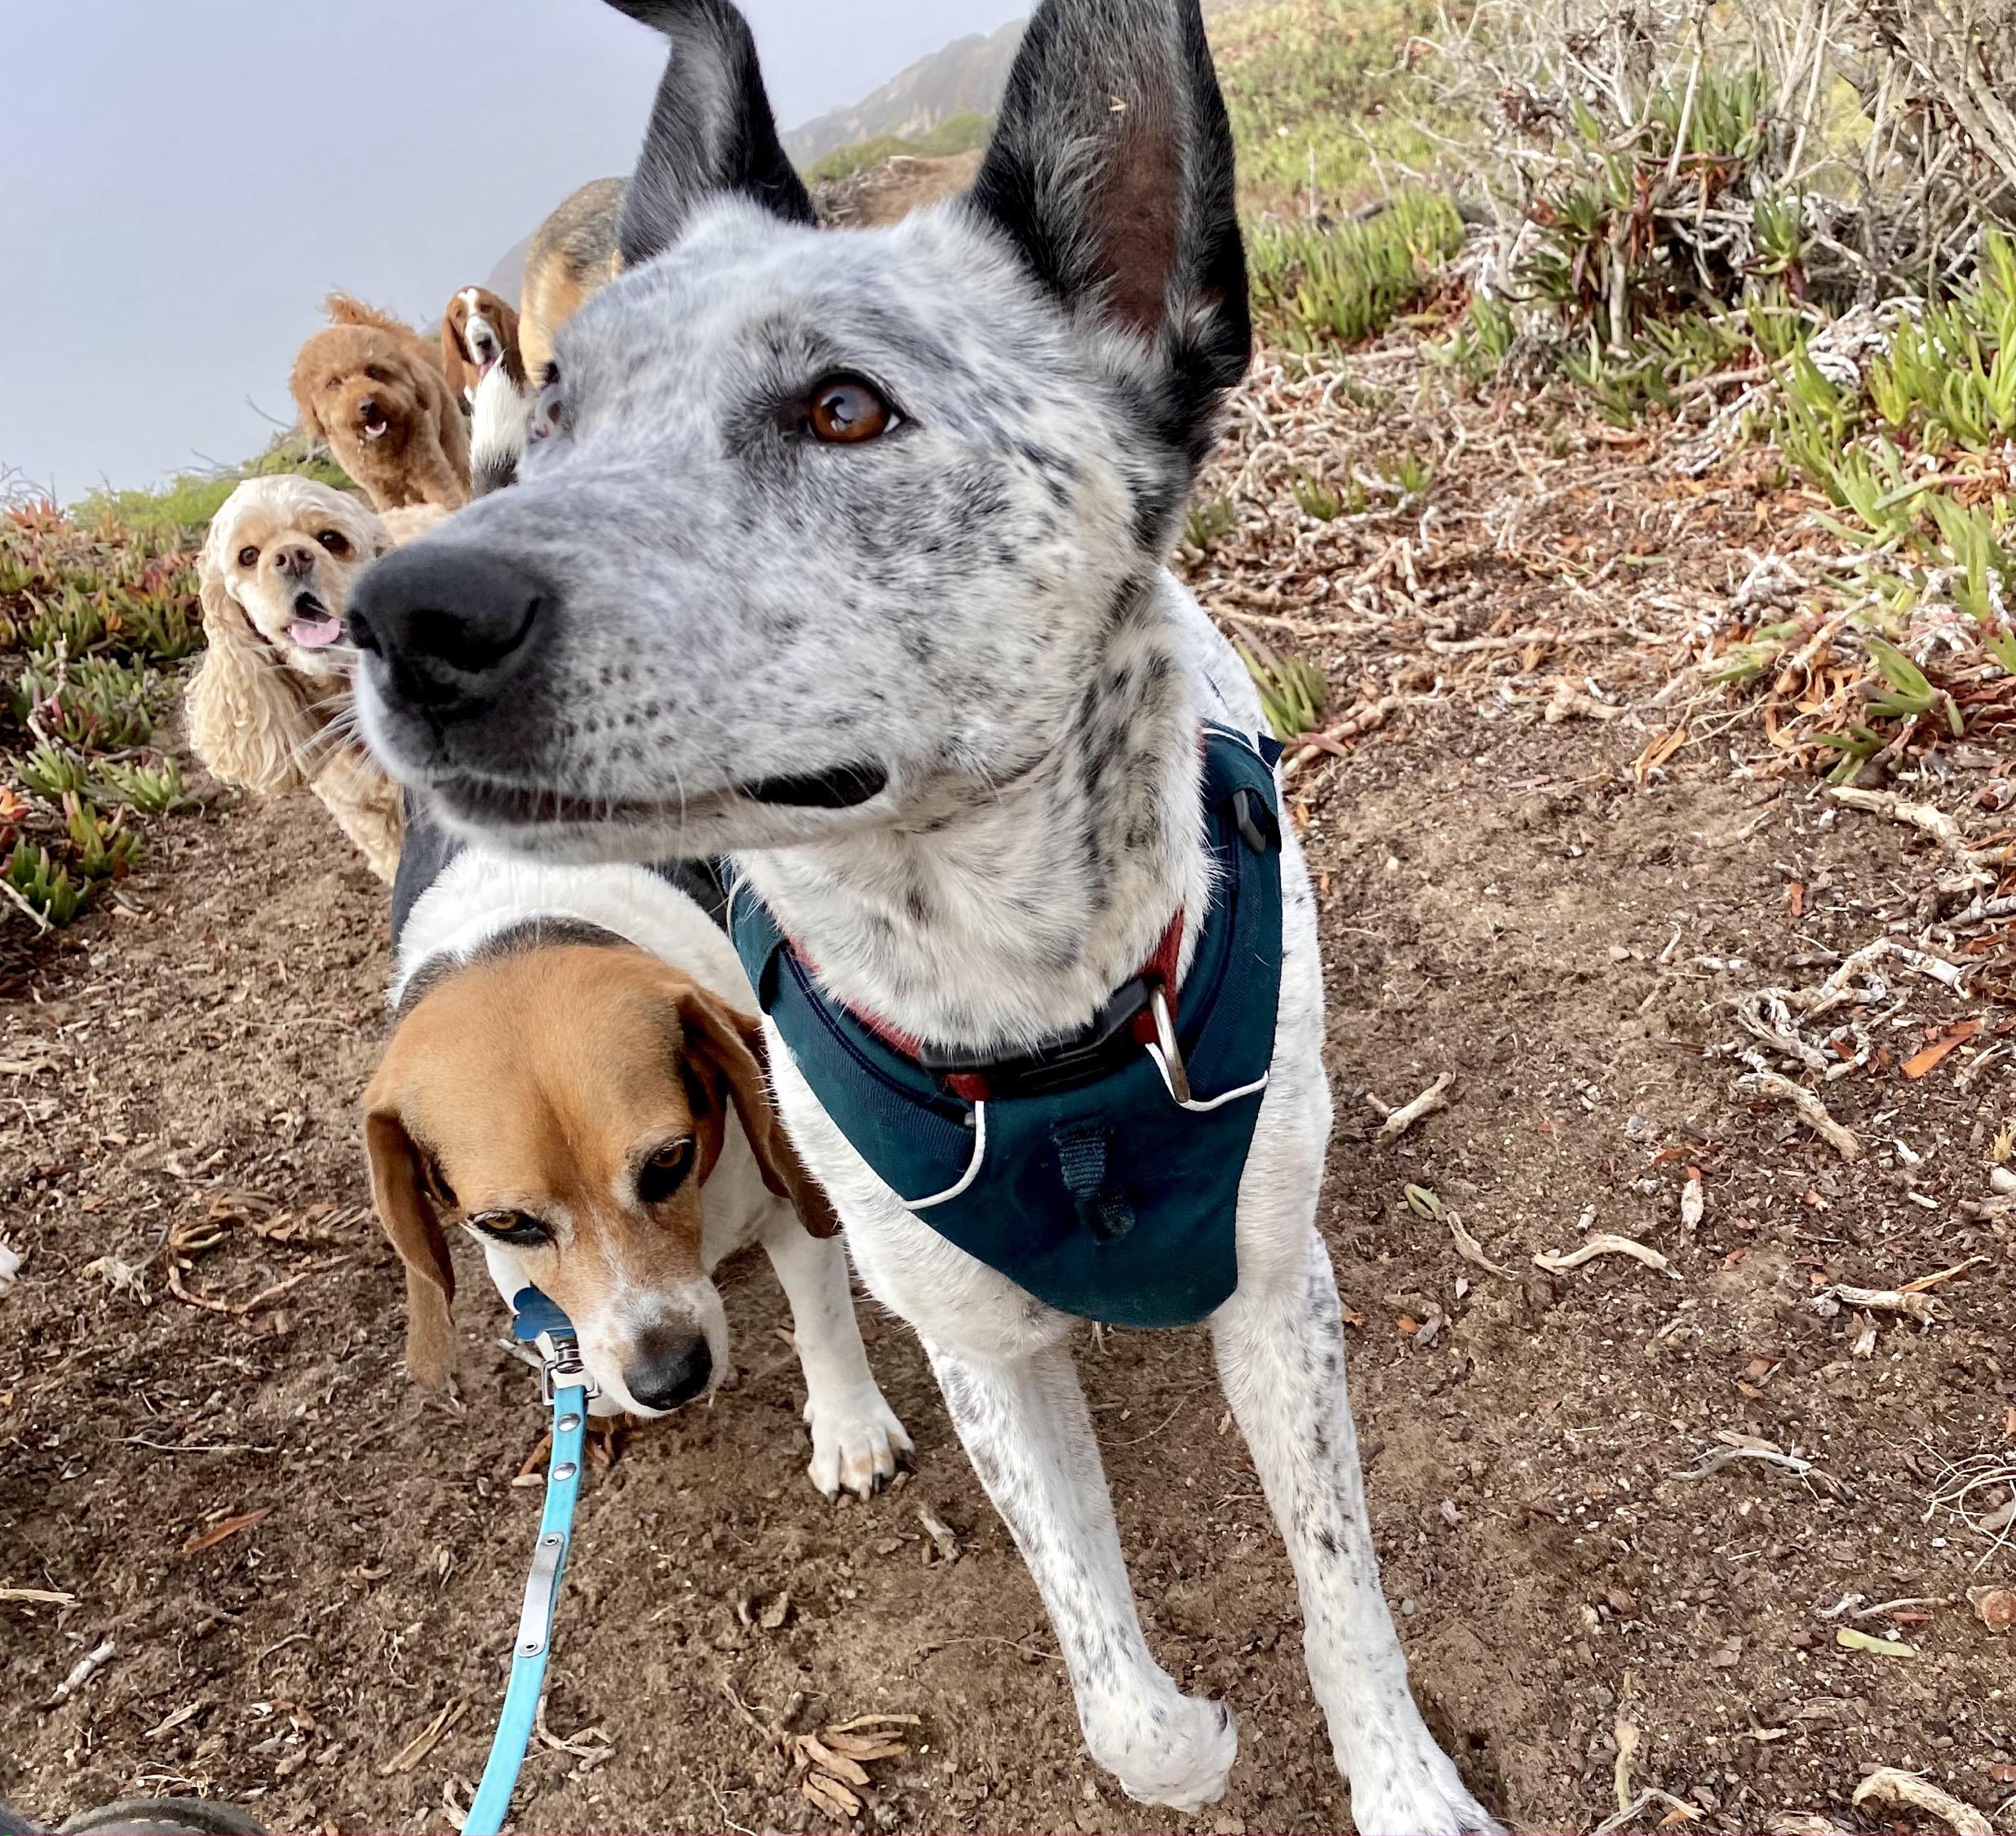 Group of Doggos